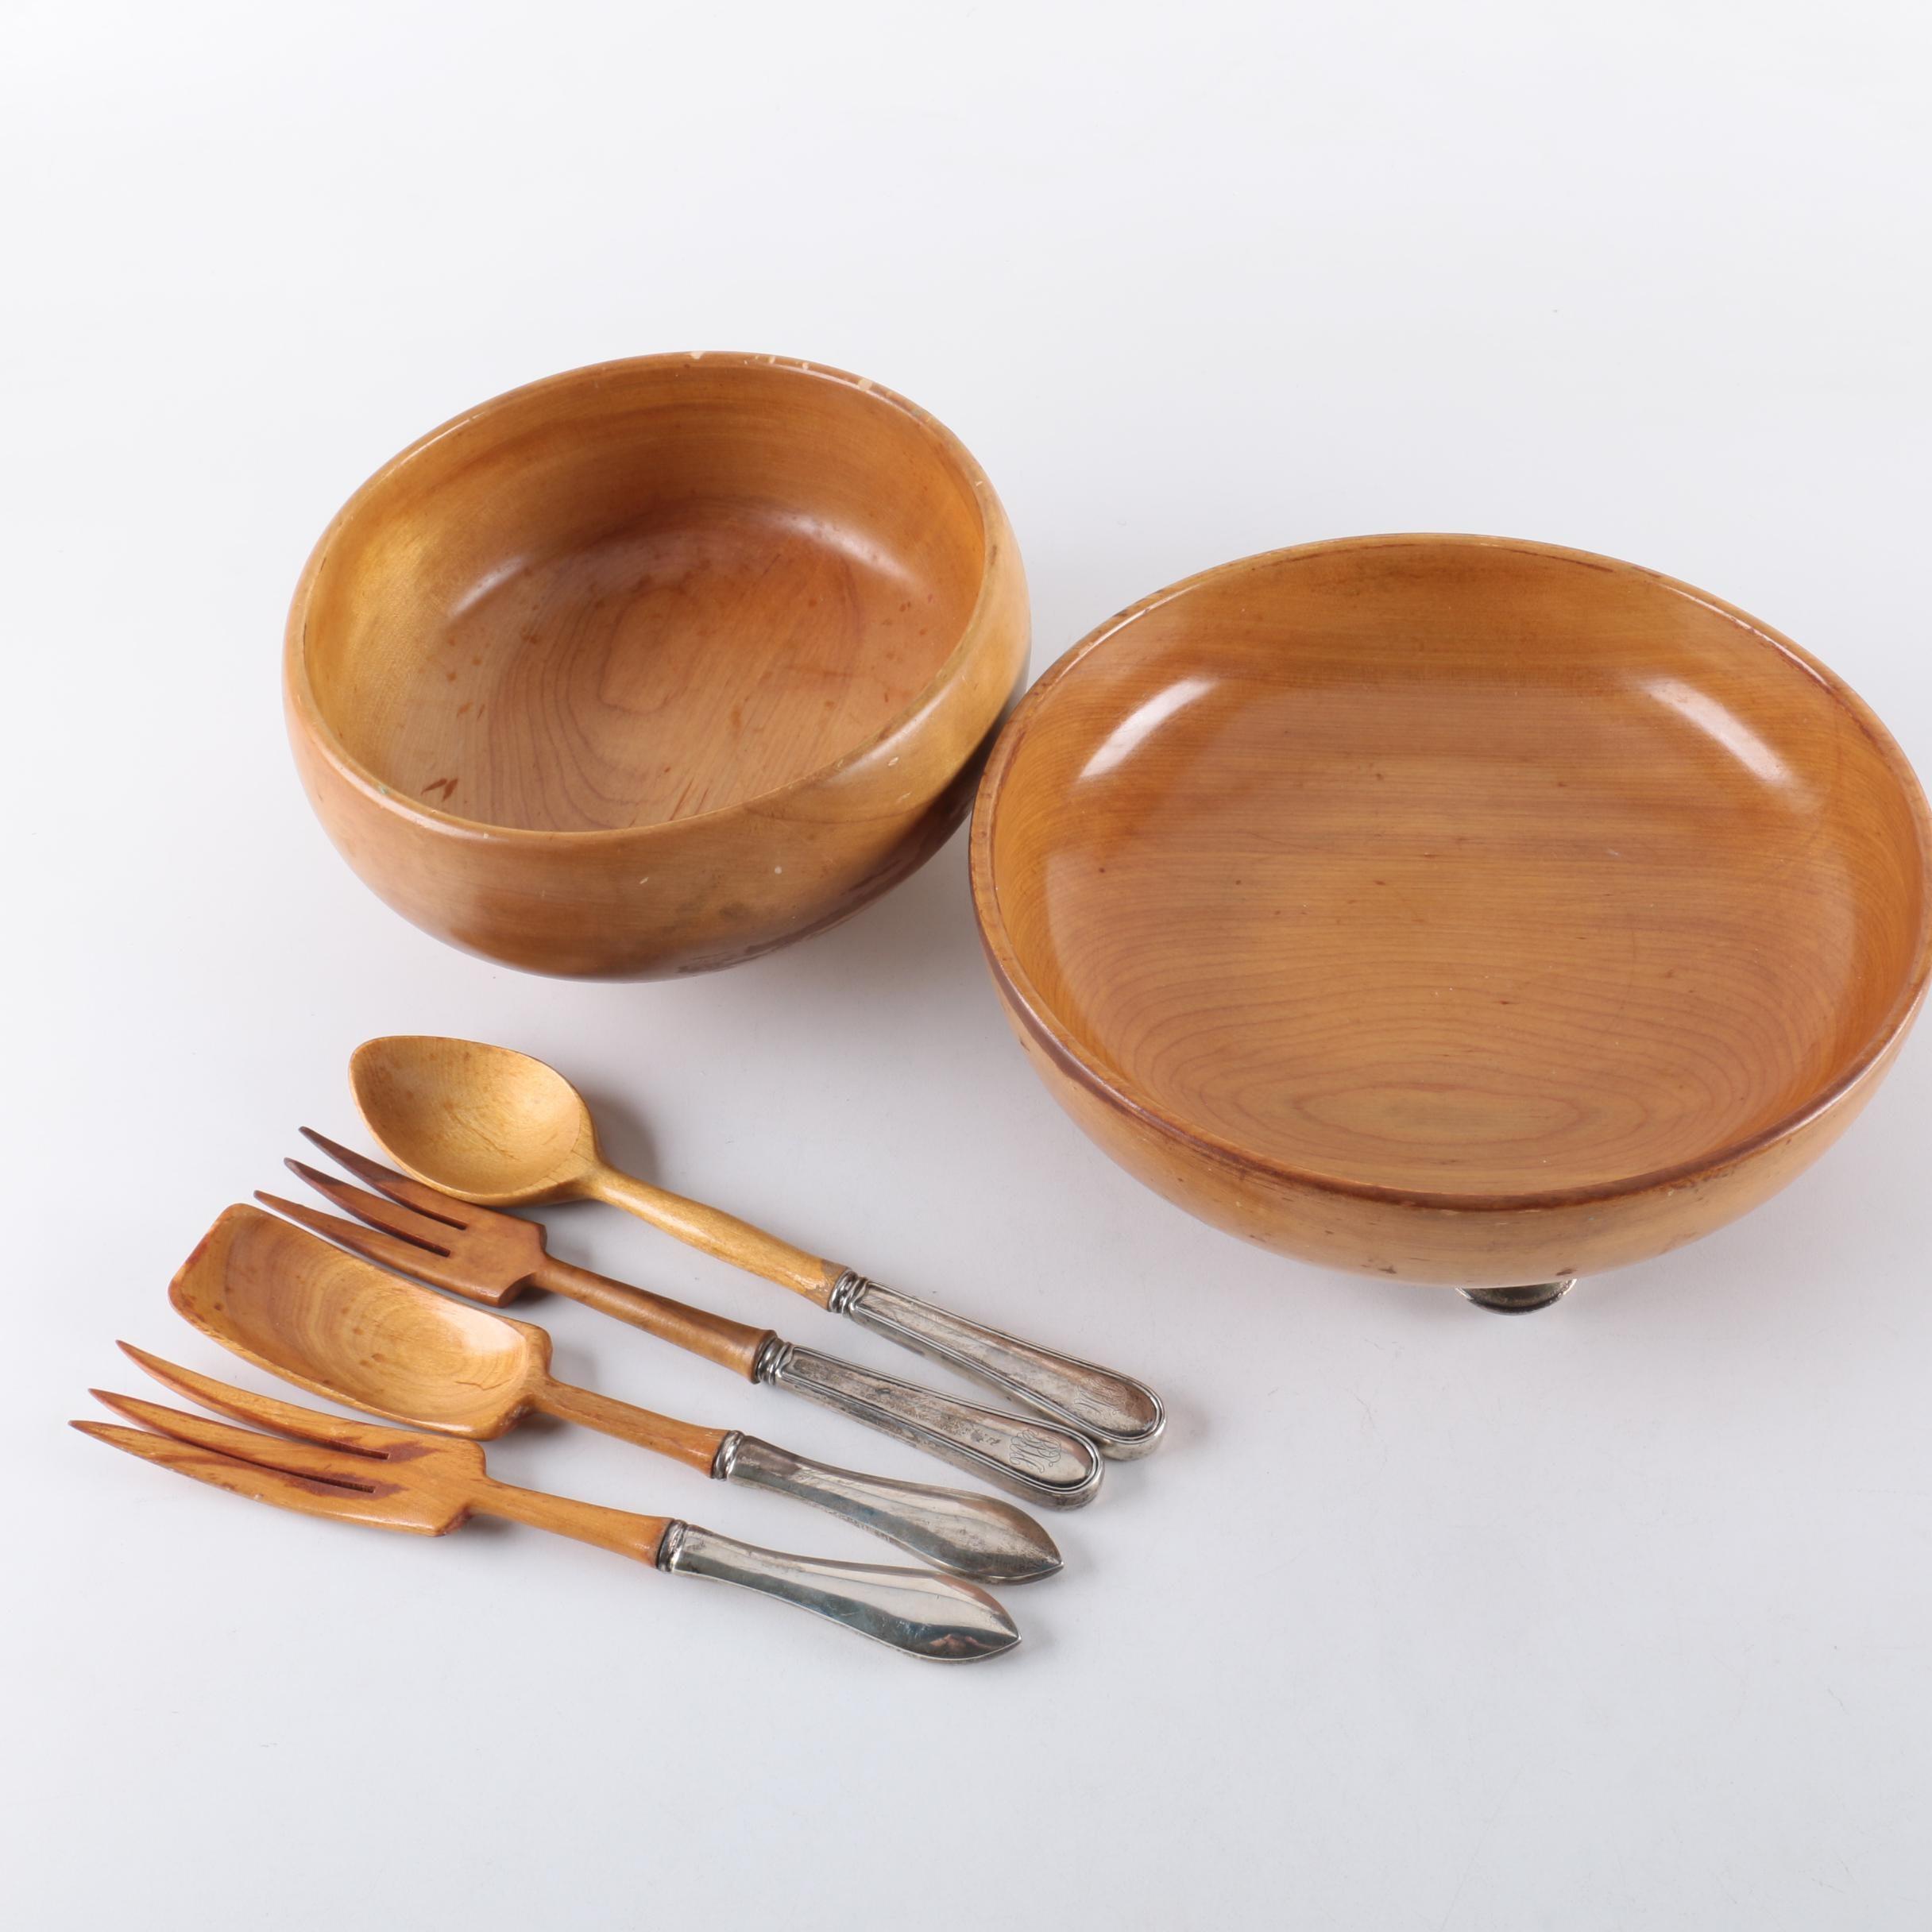 Wood Salad Bowls with Sterling Handled Serving Utensils